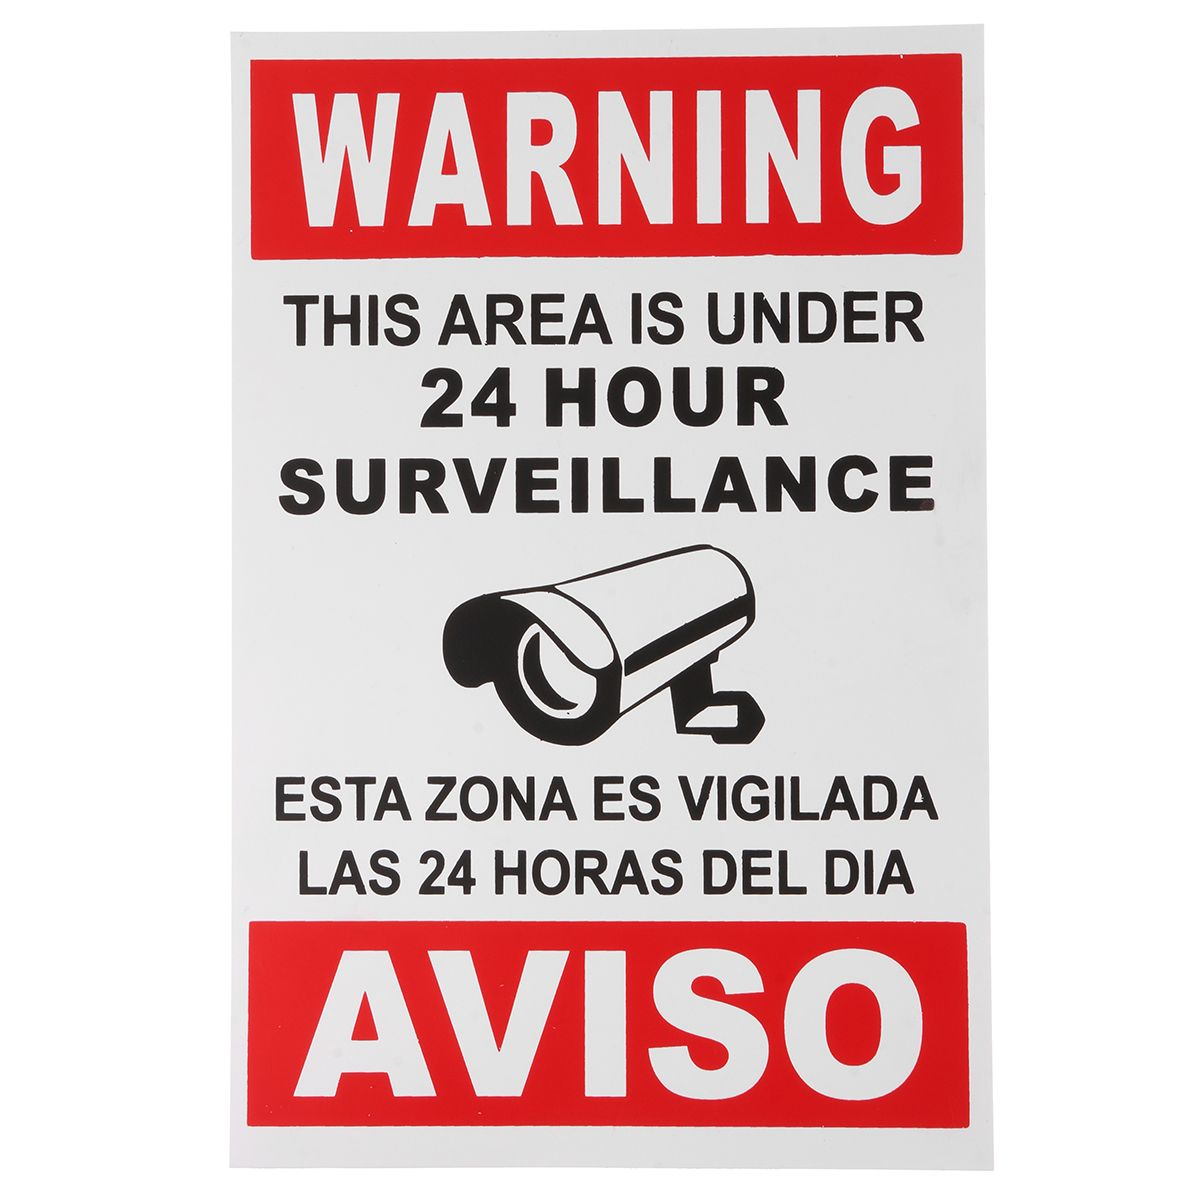 English Spanish Senal De Advertencia De Seguridad Camara Etiqueta